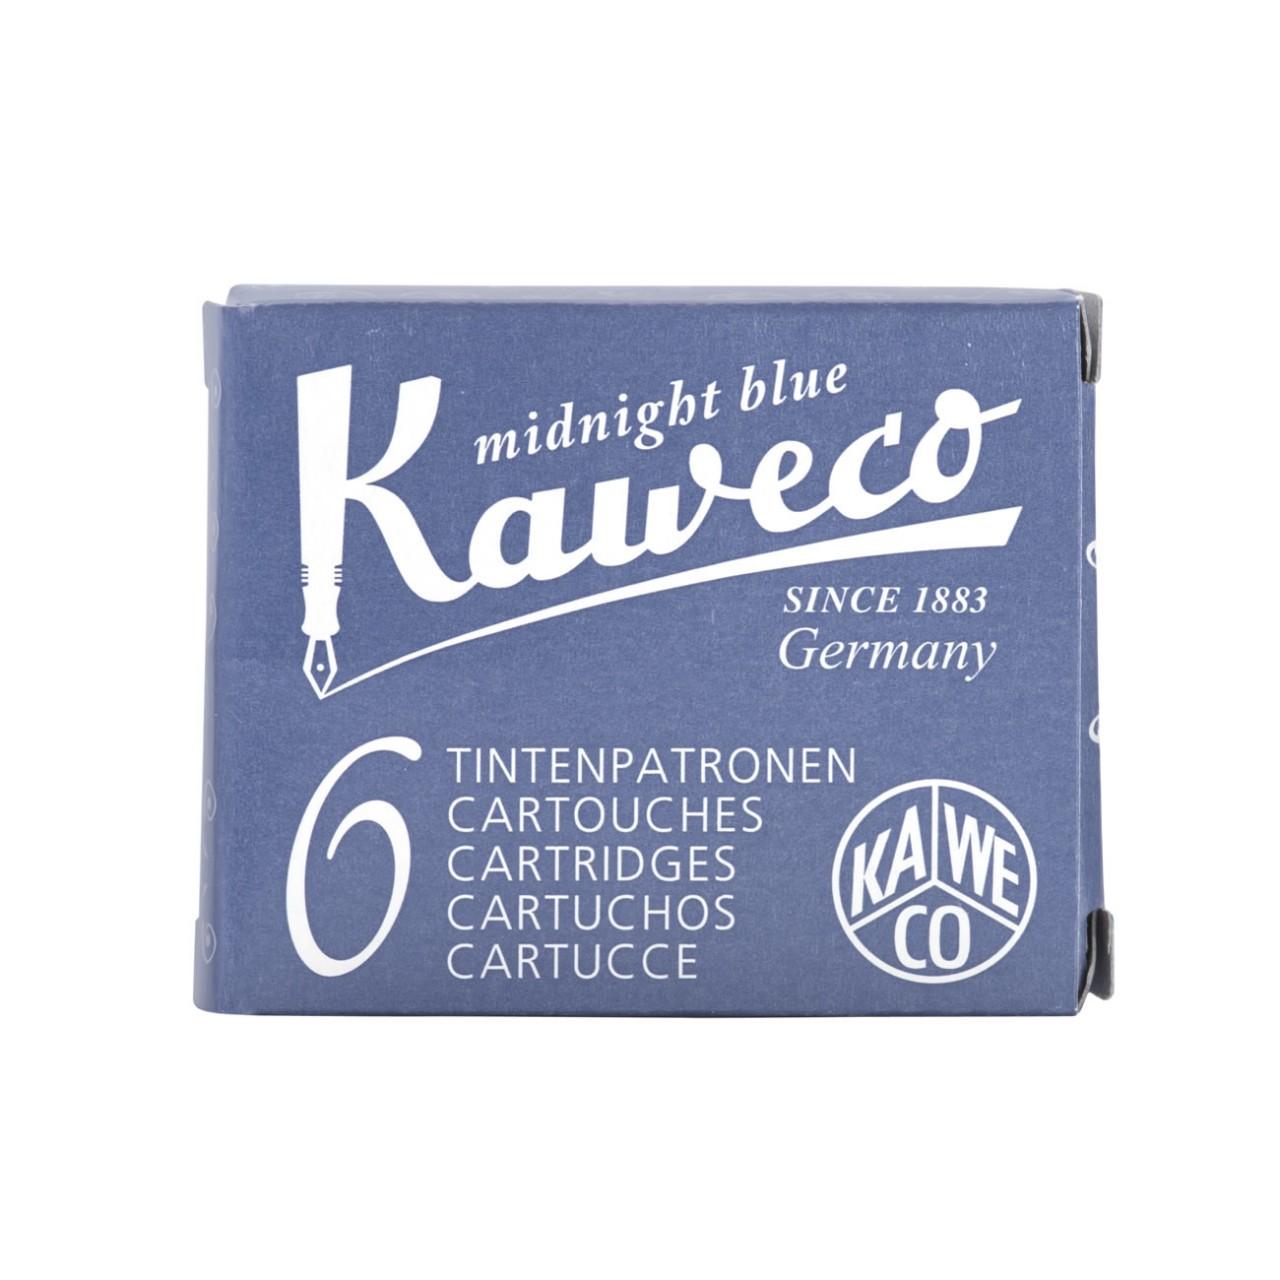 Kaweco Tintenpatronen 6 Stück mitternachtsblau VE=20 Pack